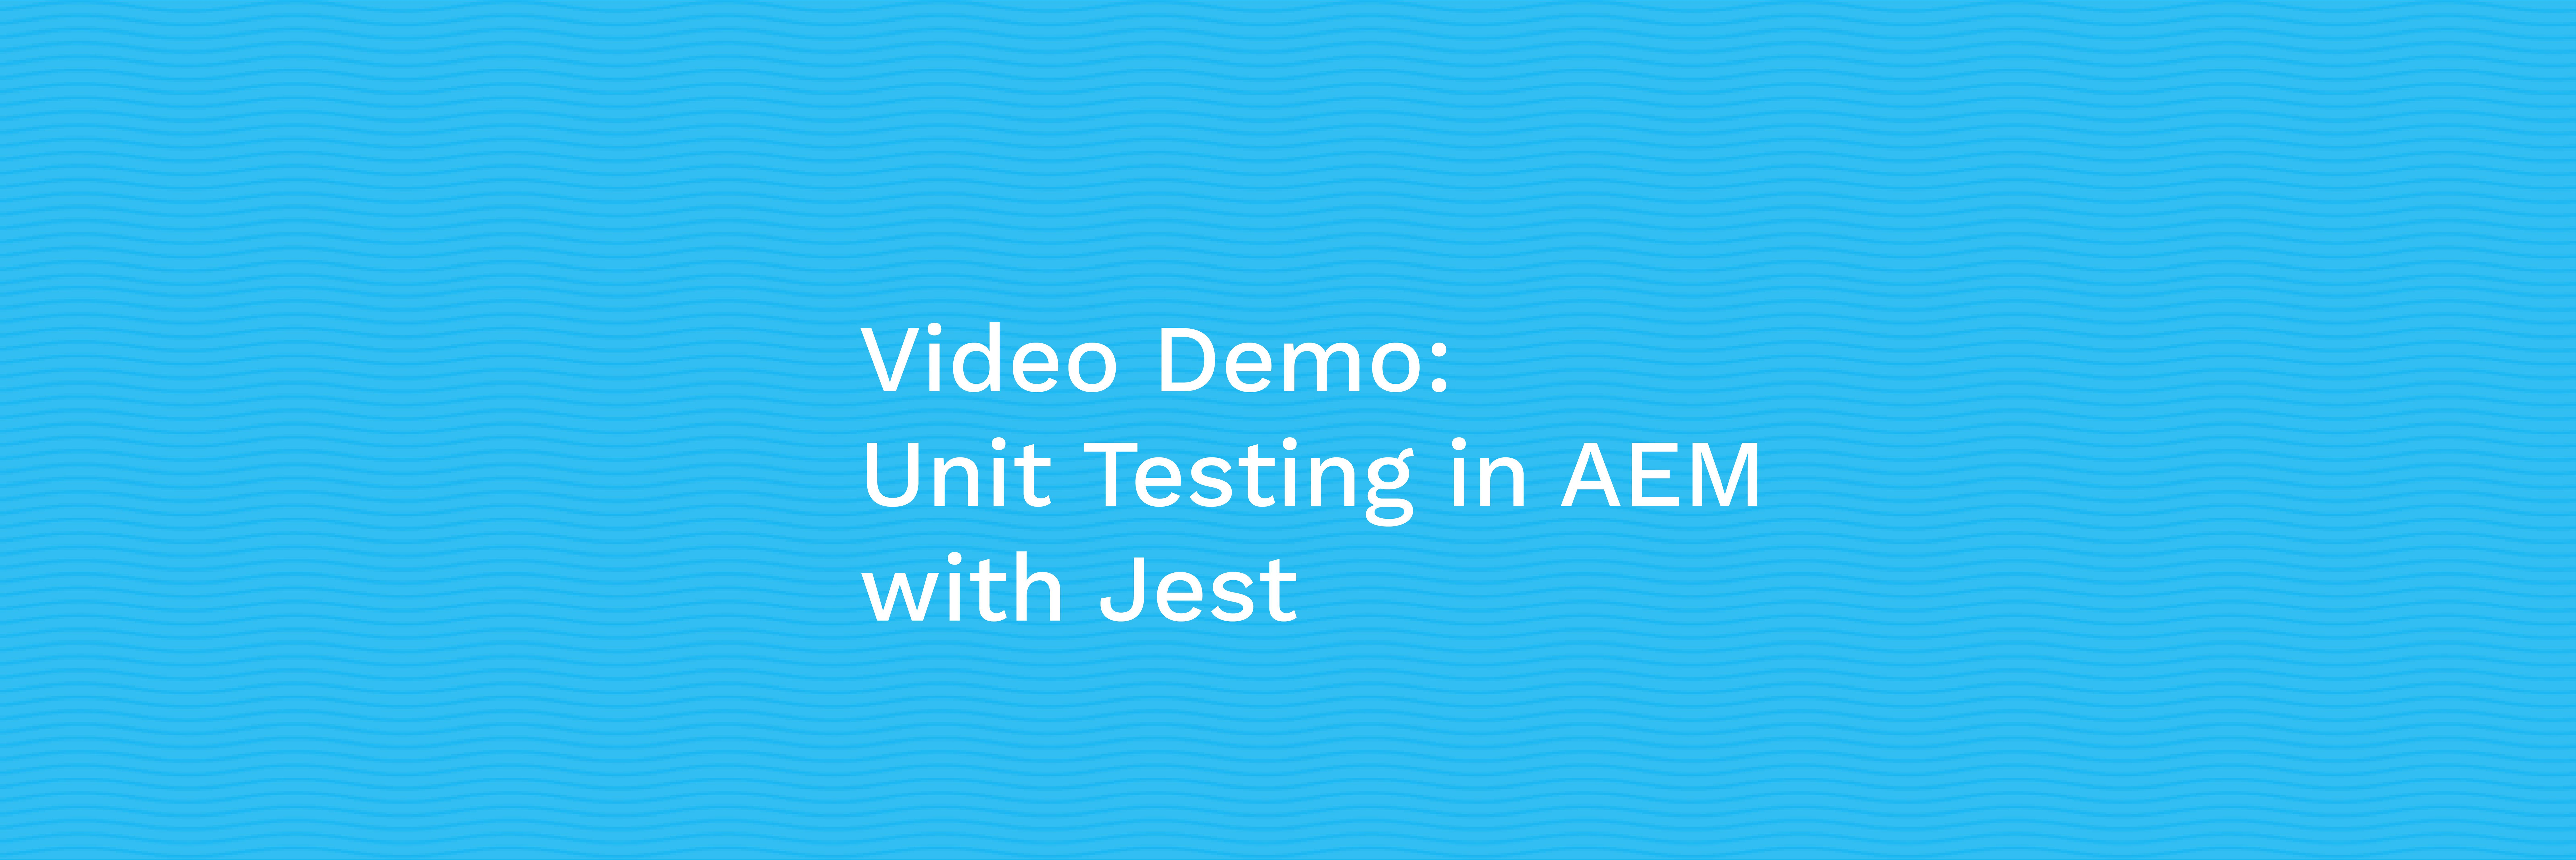 Video Demo: Unit Testing JavaScript/TypeScript in AEM with Jest